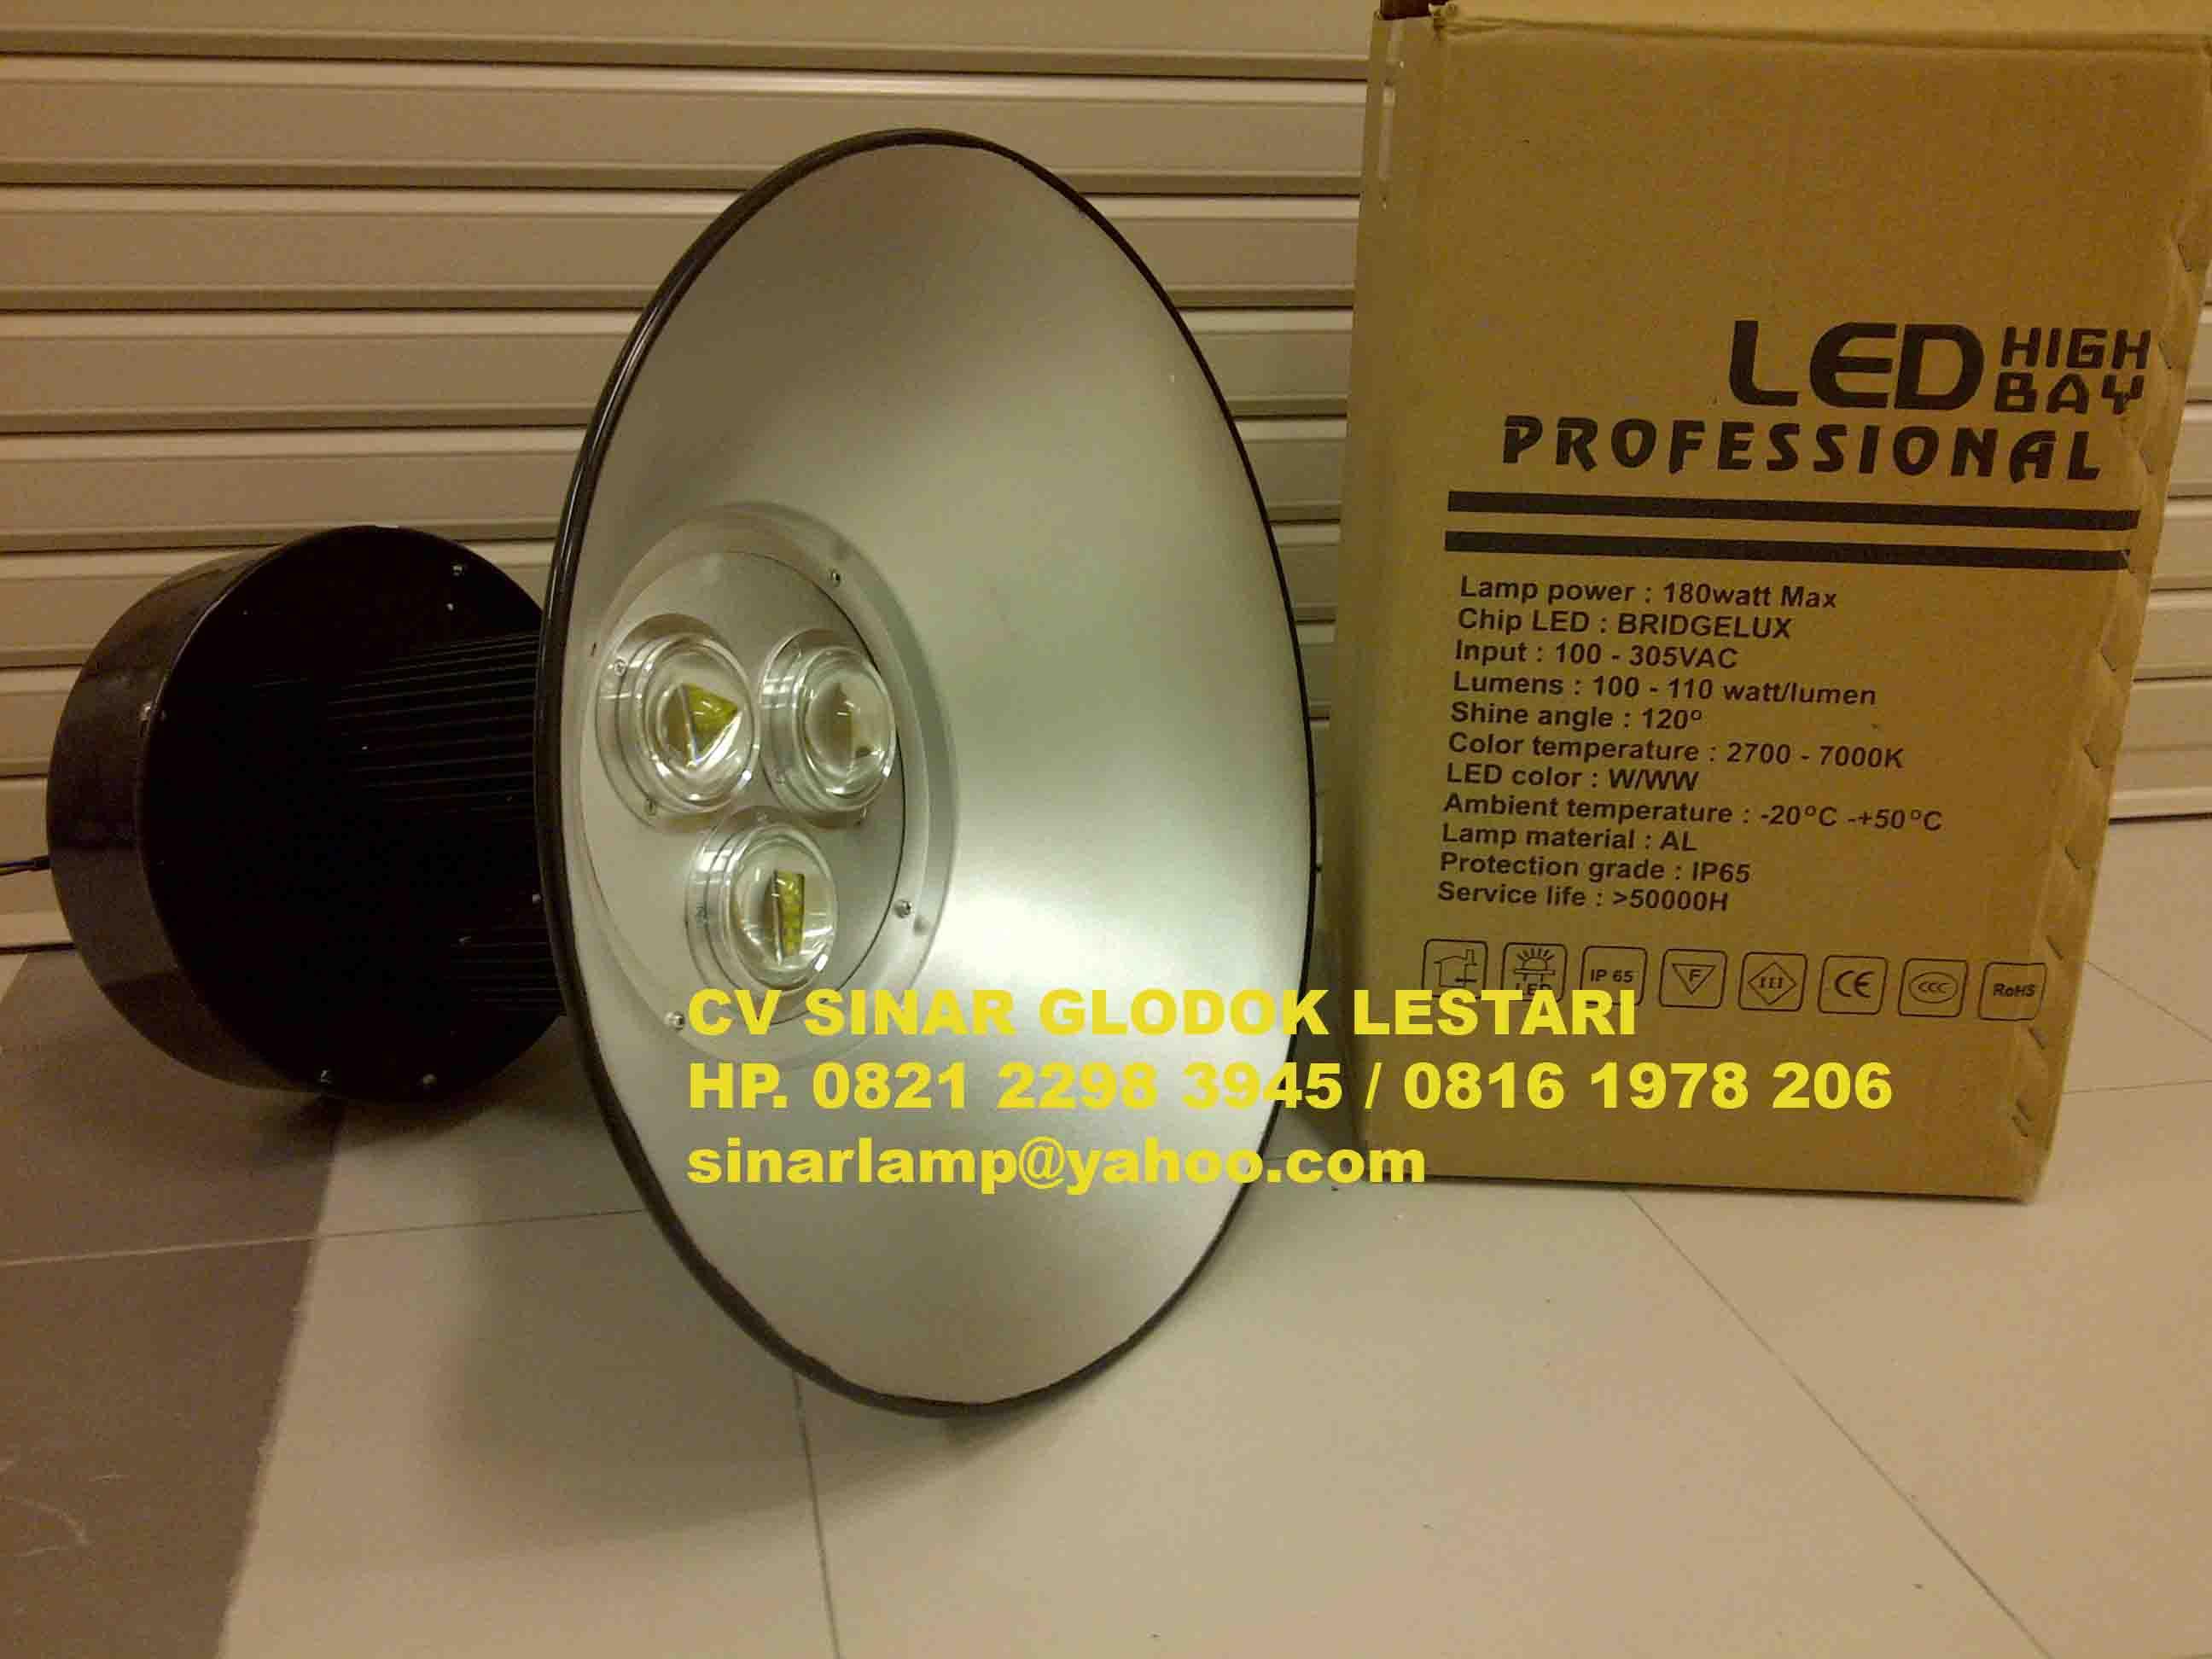 Lampu Industri Led Hdk High Bay 180w Bridgelux Agen Dan